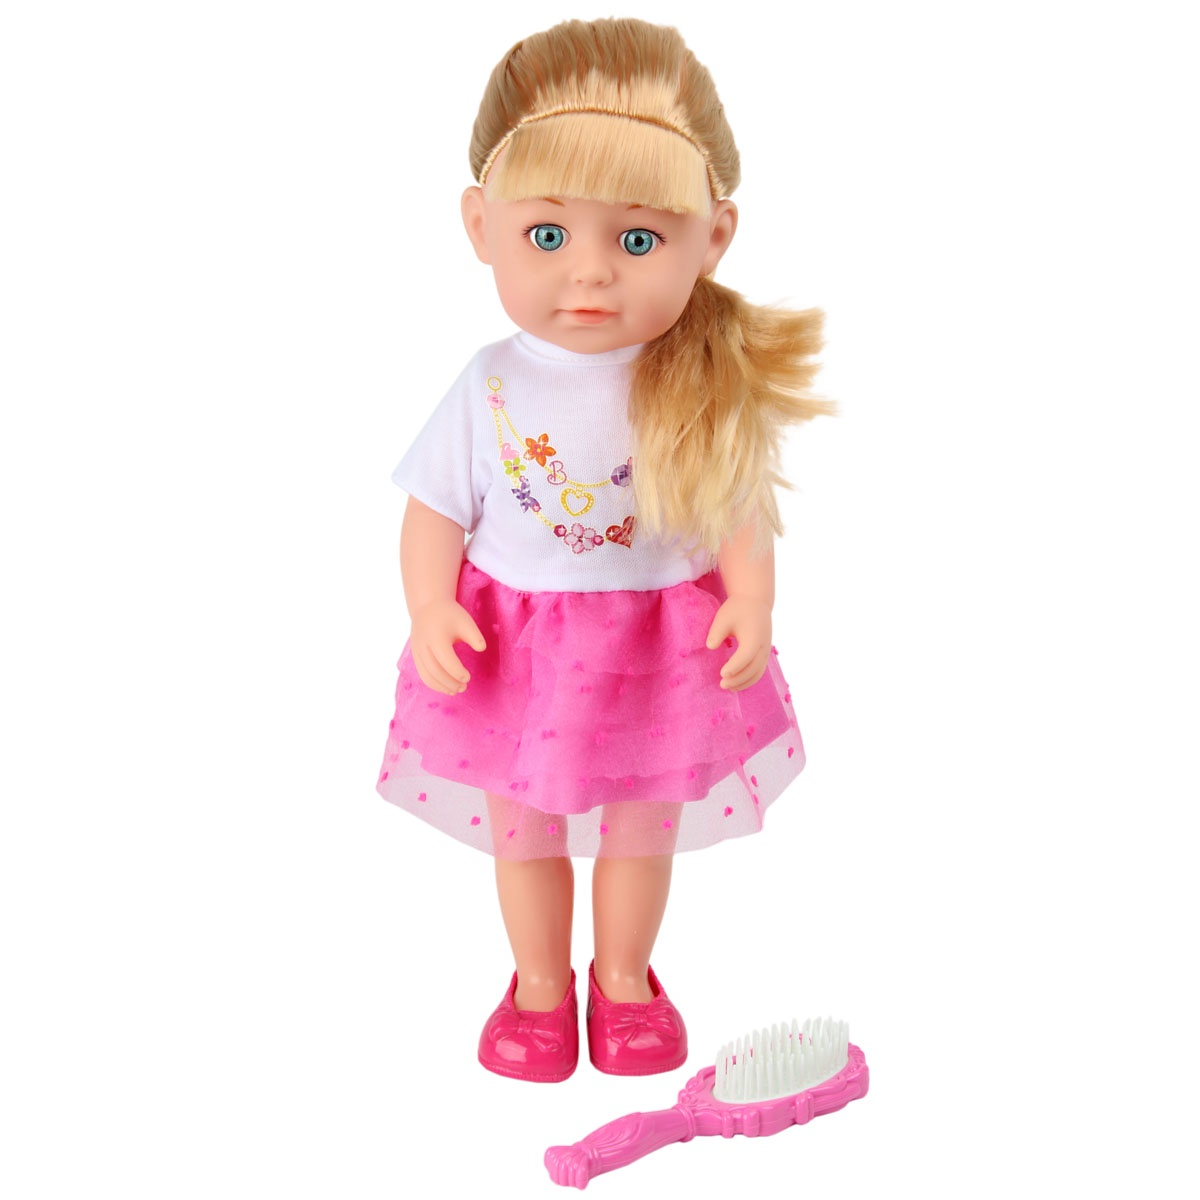 Кукла Сонечка veld co кукла цвет одежды бежевый розовый